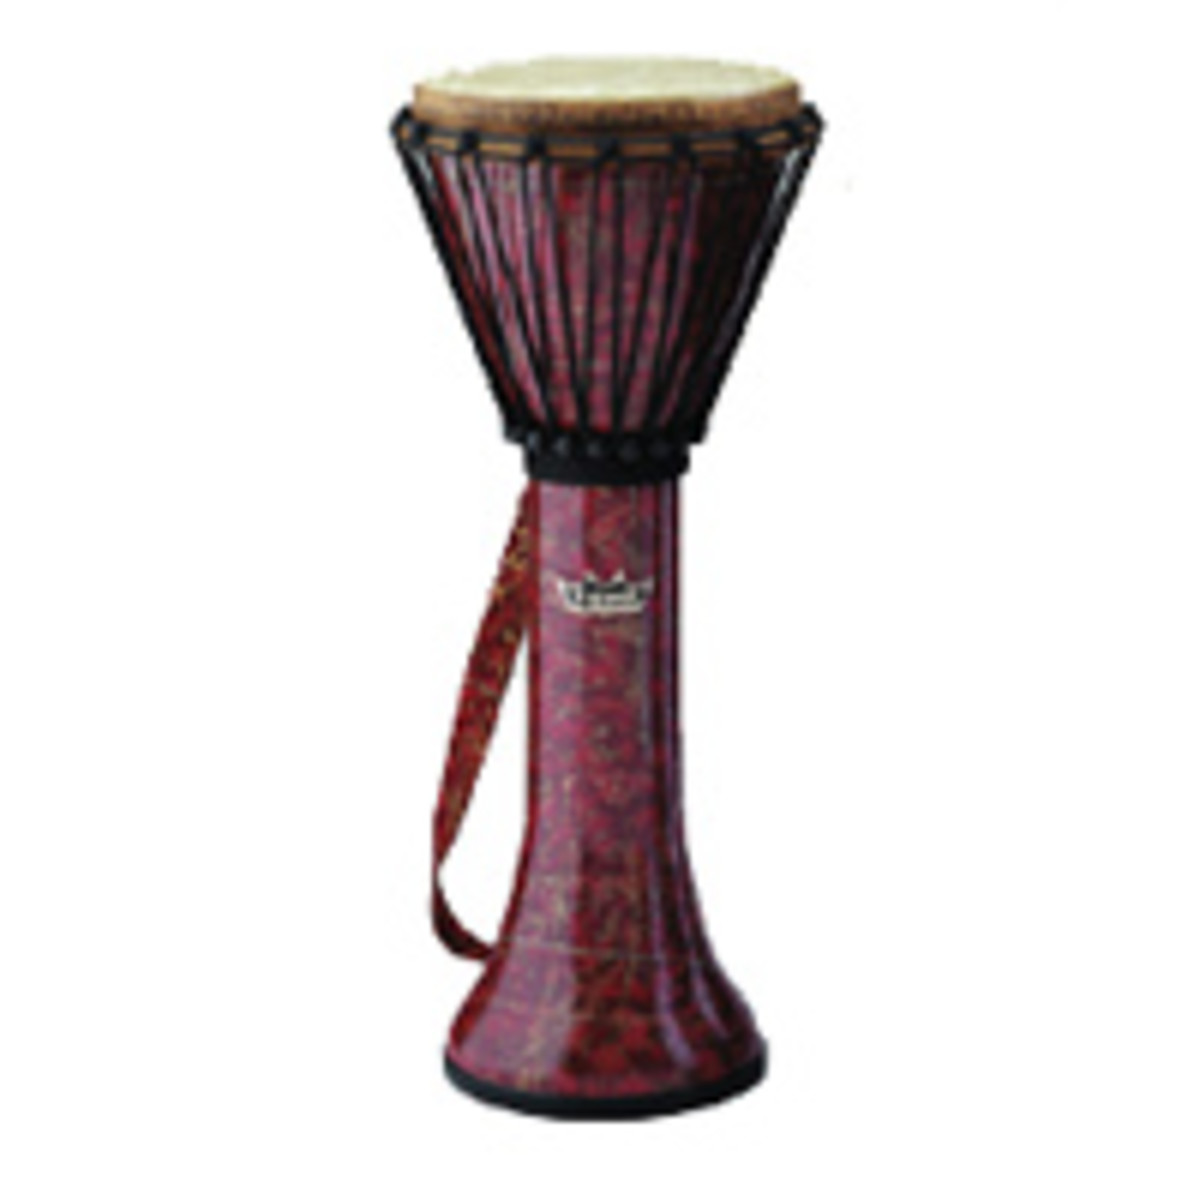 Remo Klong Yaw Drum 27'' x 8'' at Gear4music.com